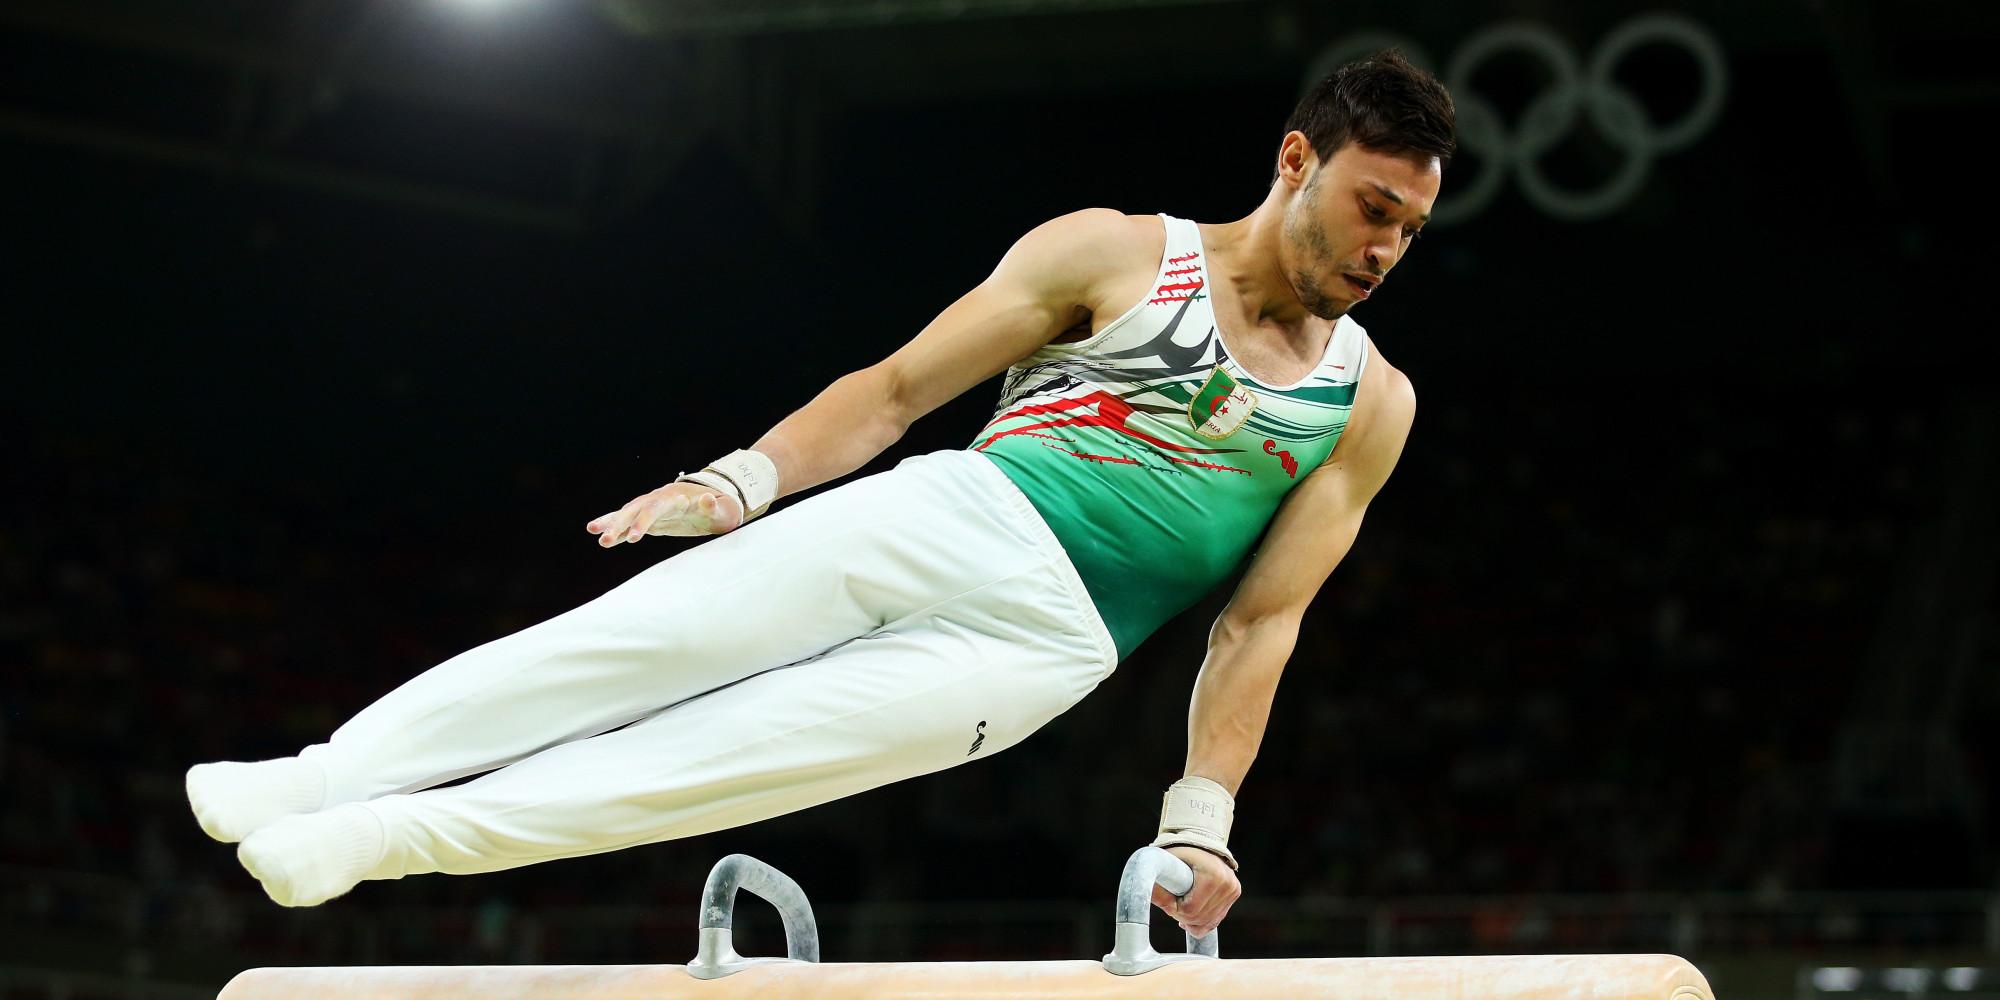 Rio 2016 gymnastique artistique l 39 alg rien bourguieg - Table de saut gymnova ...